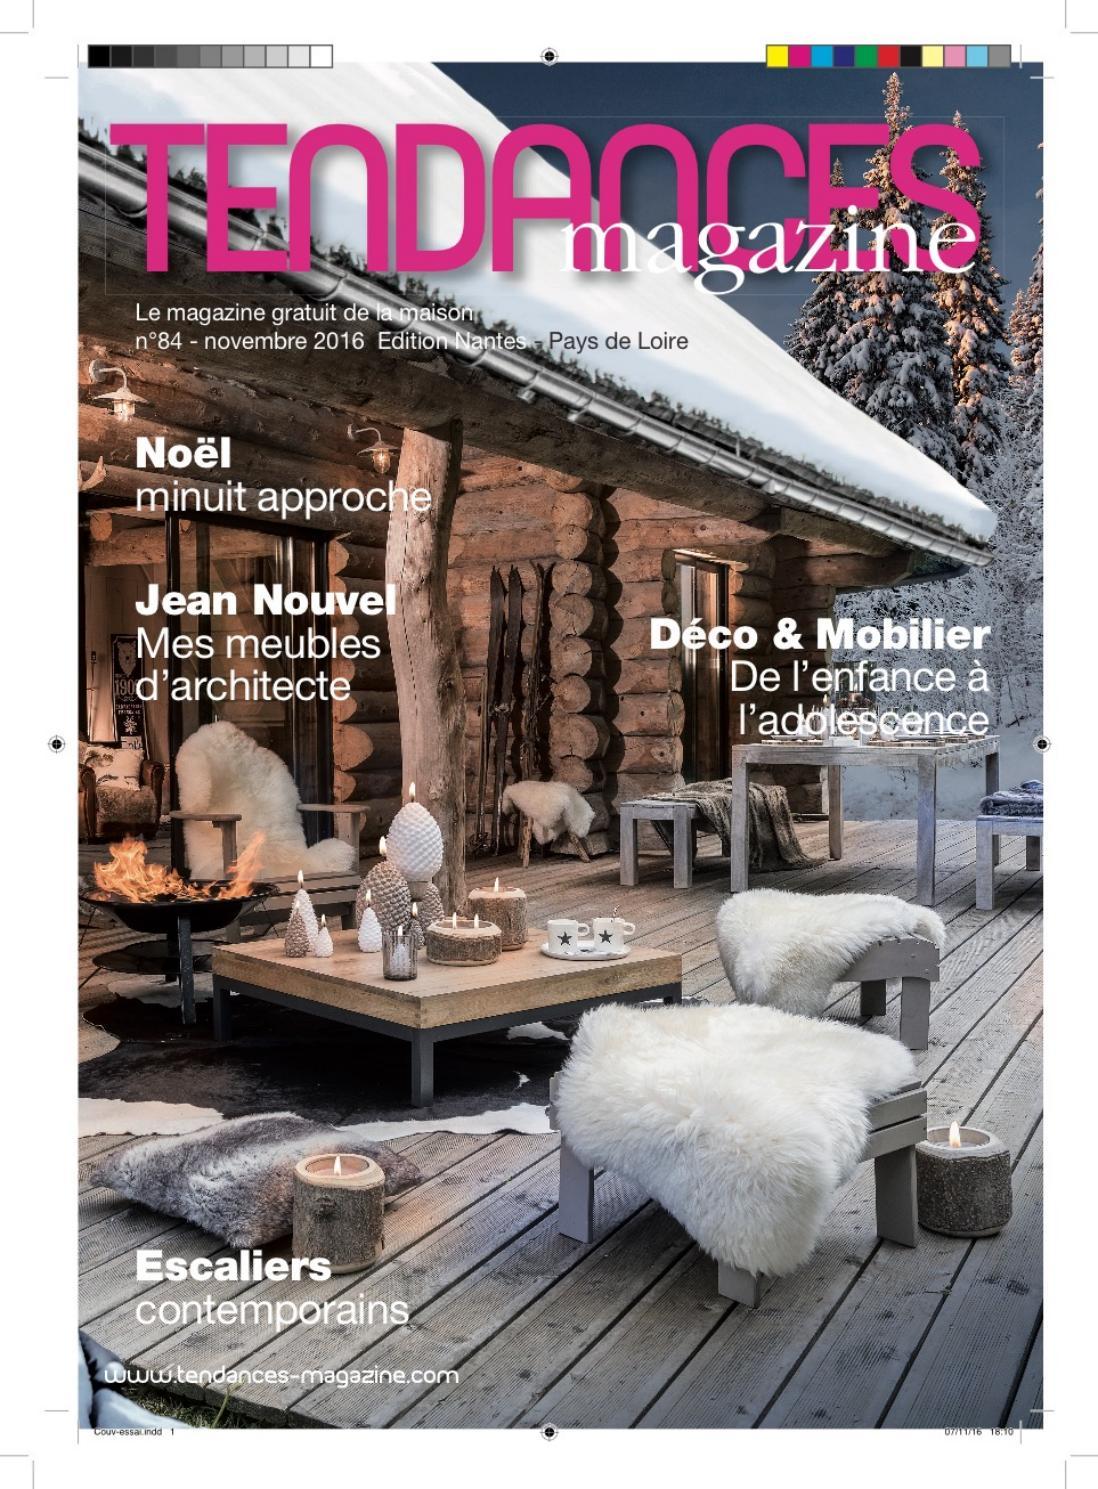 Tendances magazine dition nantes novembre 2016 by dupire for Magazine tendance deco